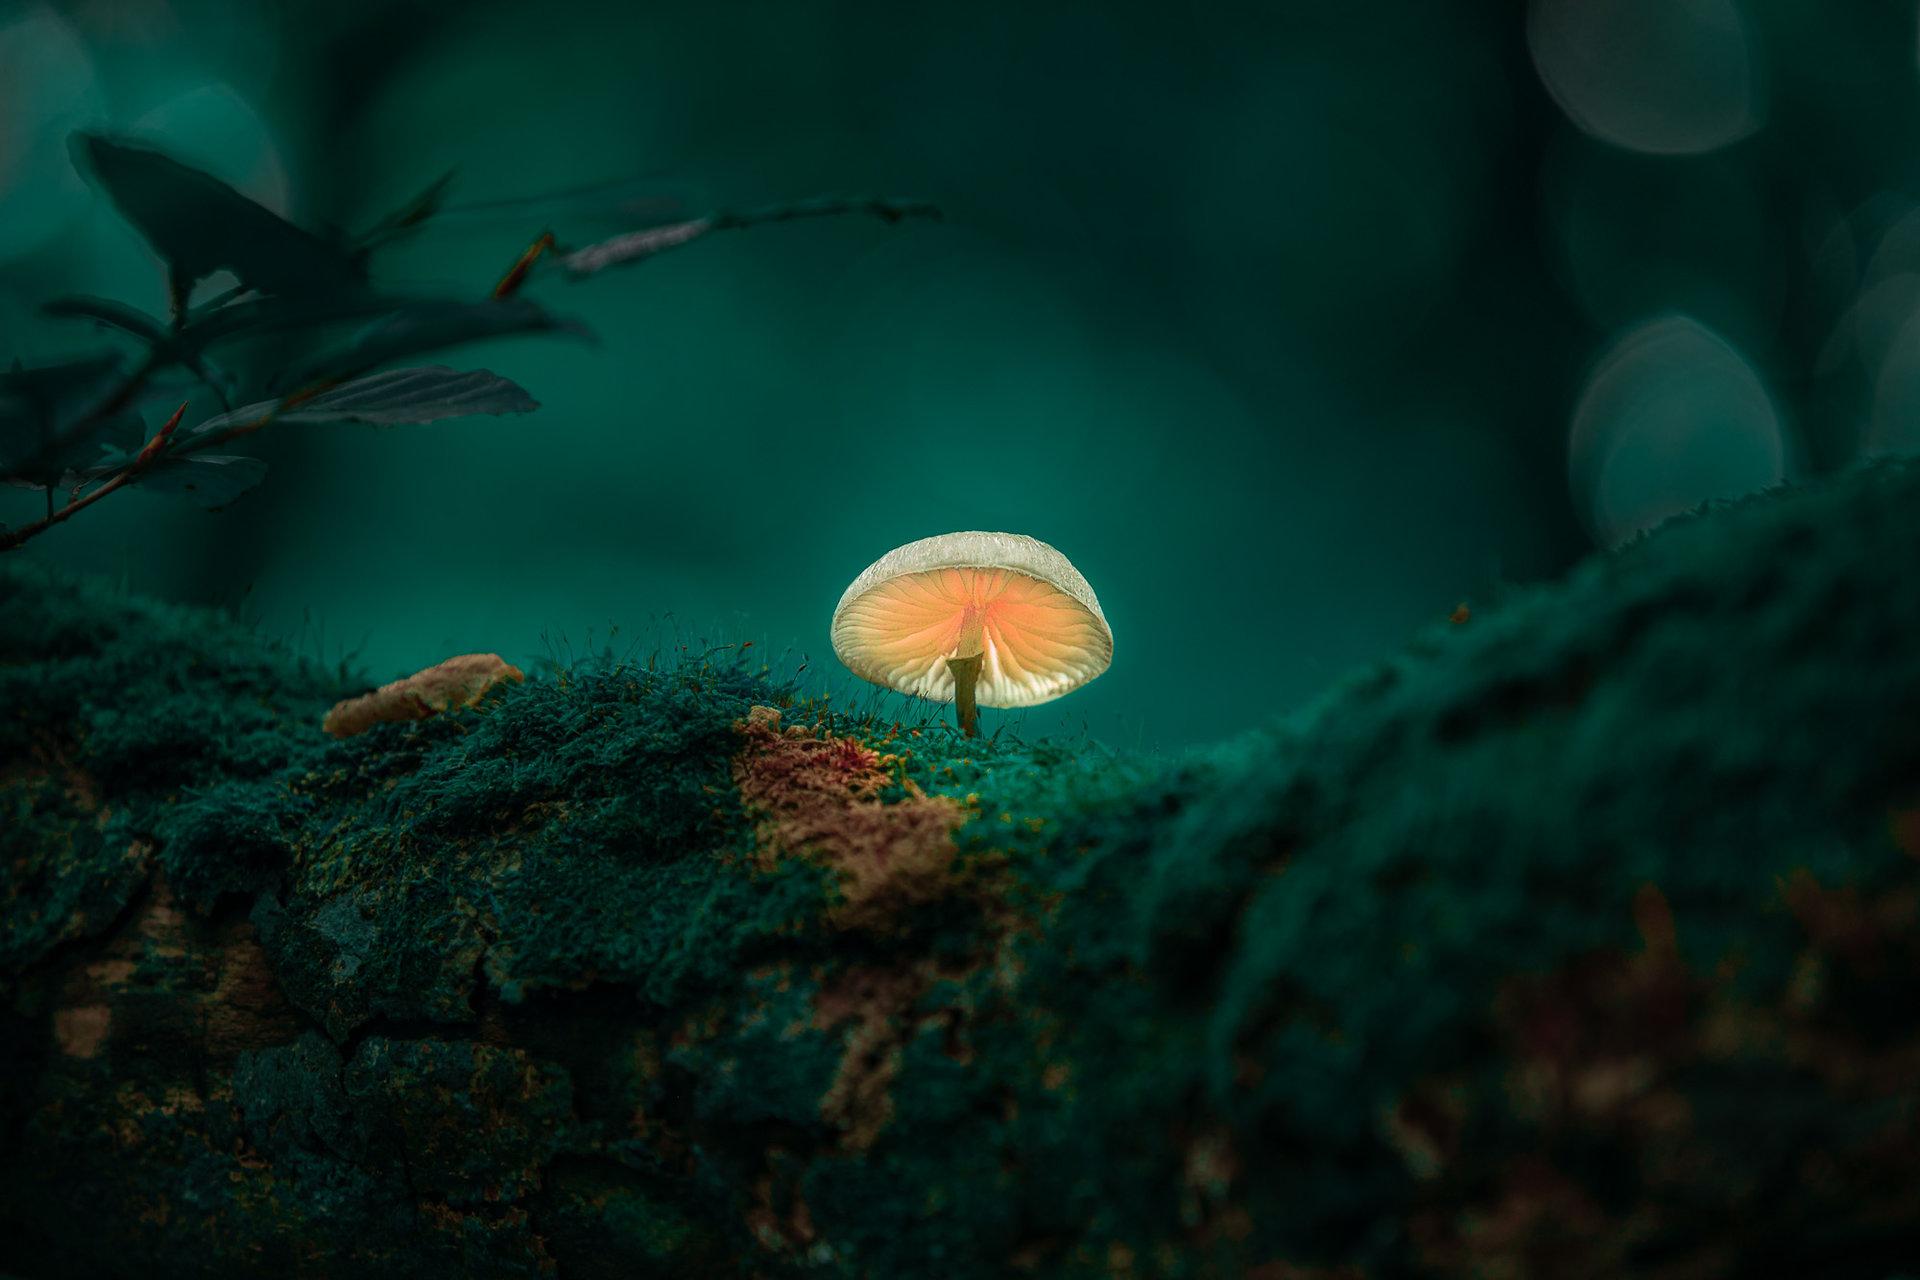 Photo in Nature | Author Ivaylo Petrov - bayivobg70 | PHOTO FORUM